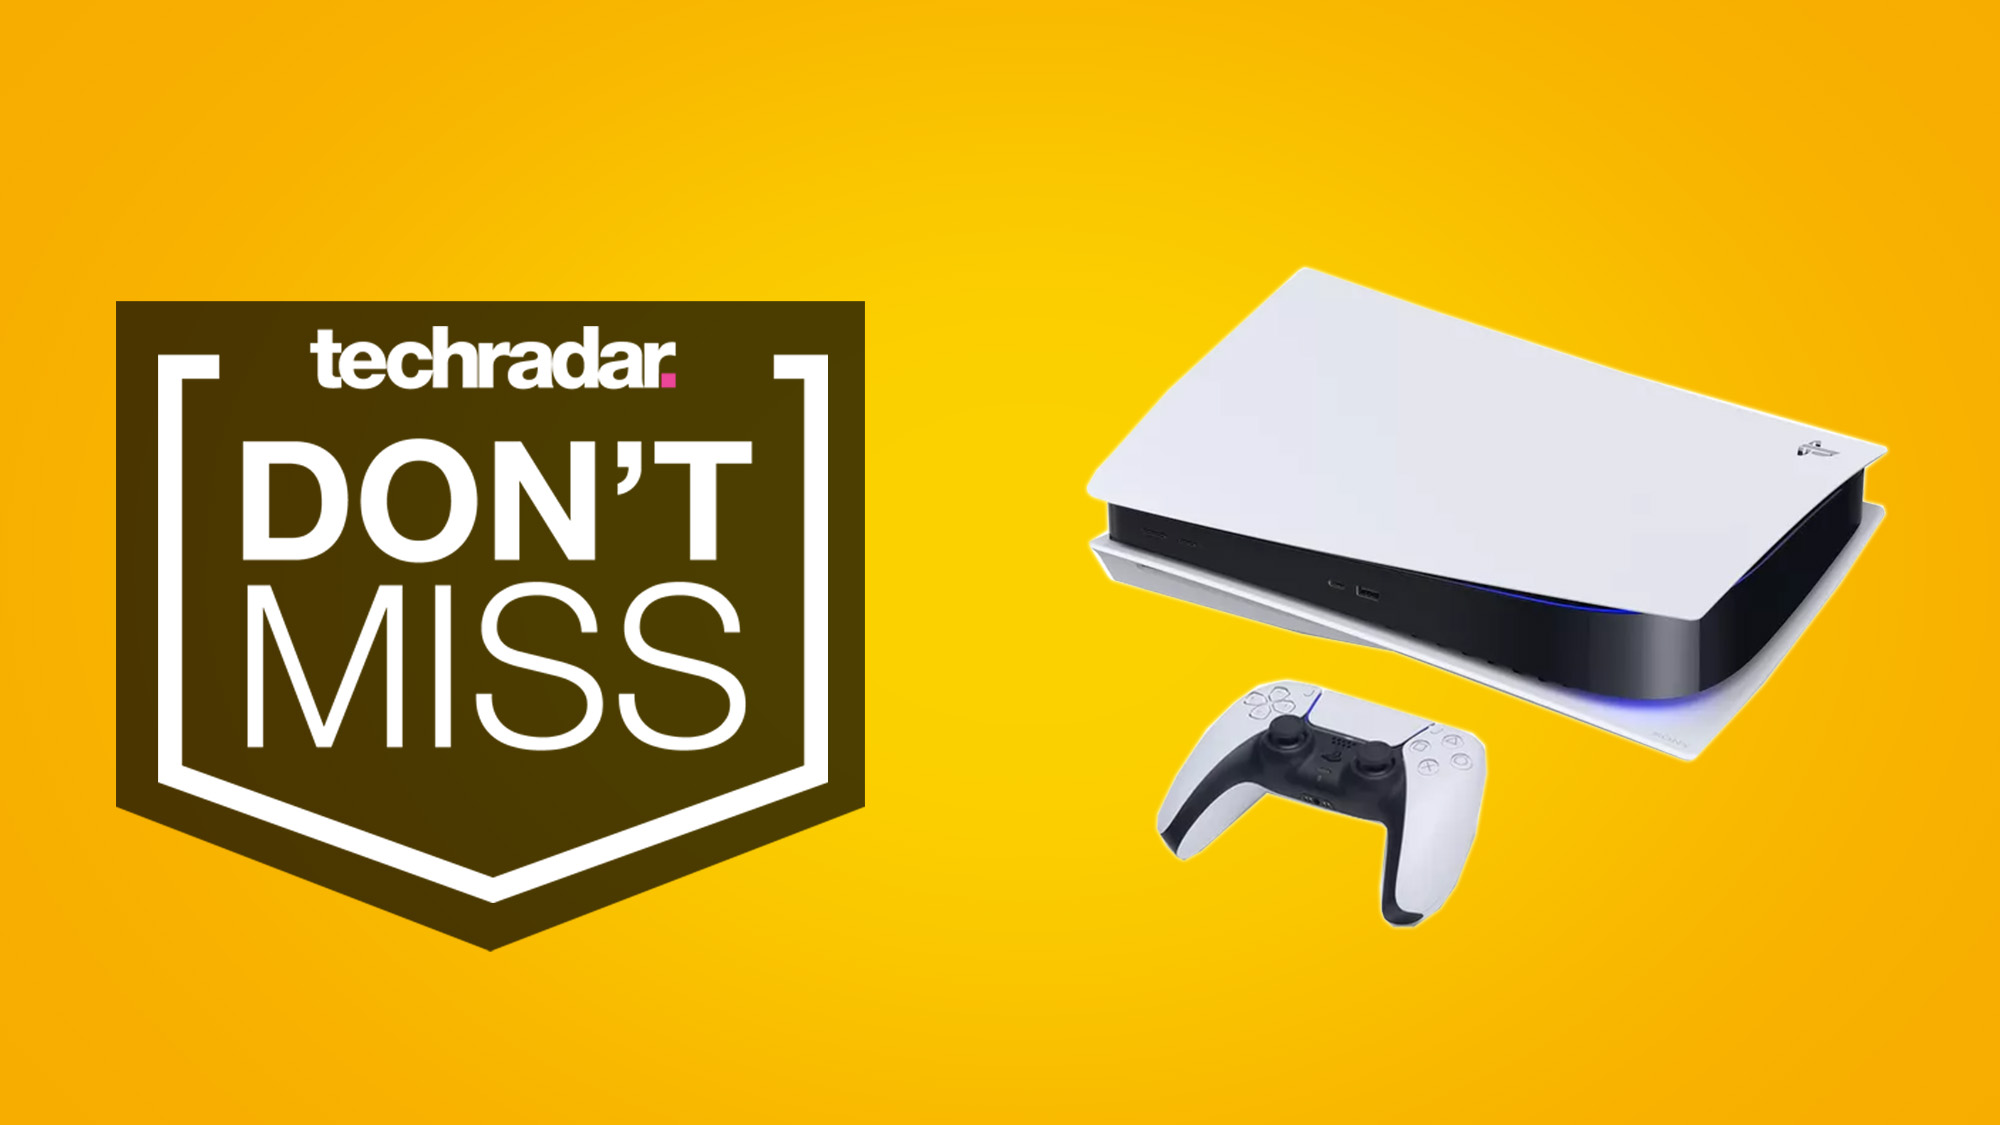 ps5-restock-update:-best-buy,-target-and-gamestop-–-when-ps5-will-be-in-stock-next